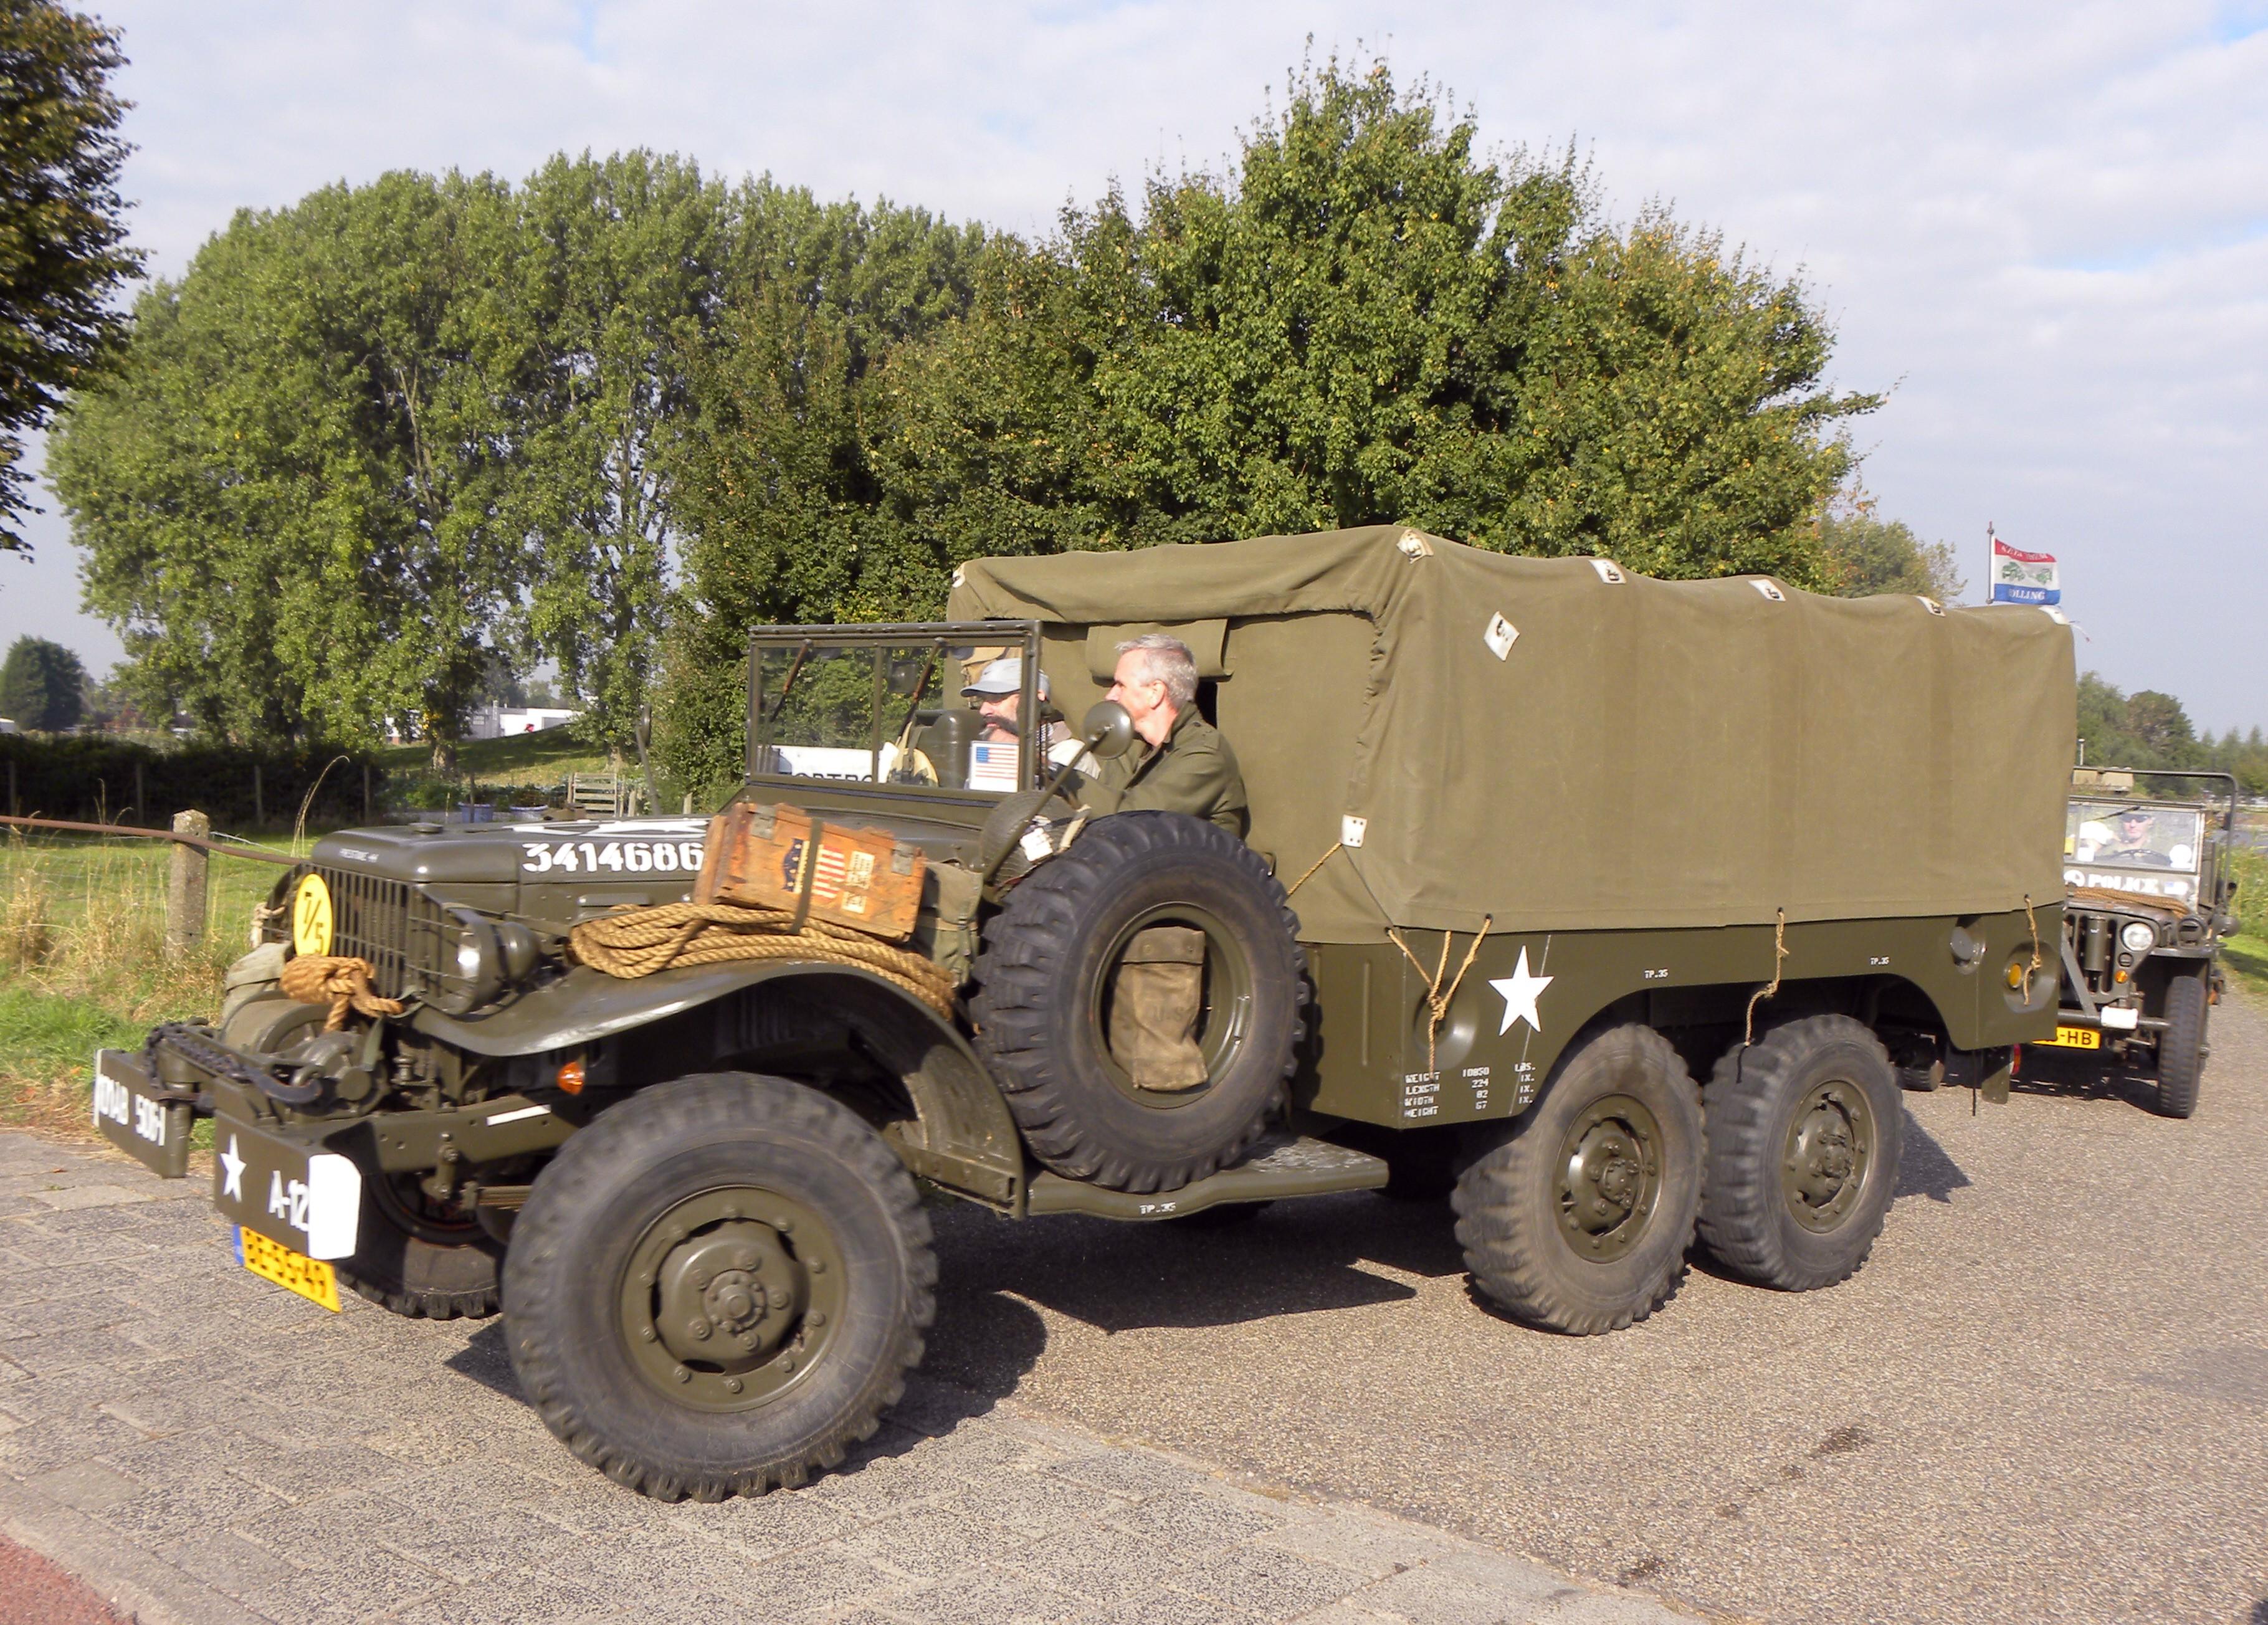 63 Power Wagon >> File:Dodge WC 63.jpg - Wikimedia Commons